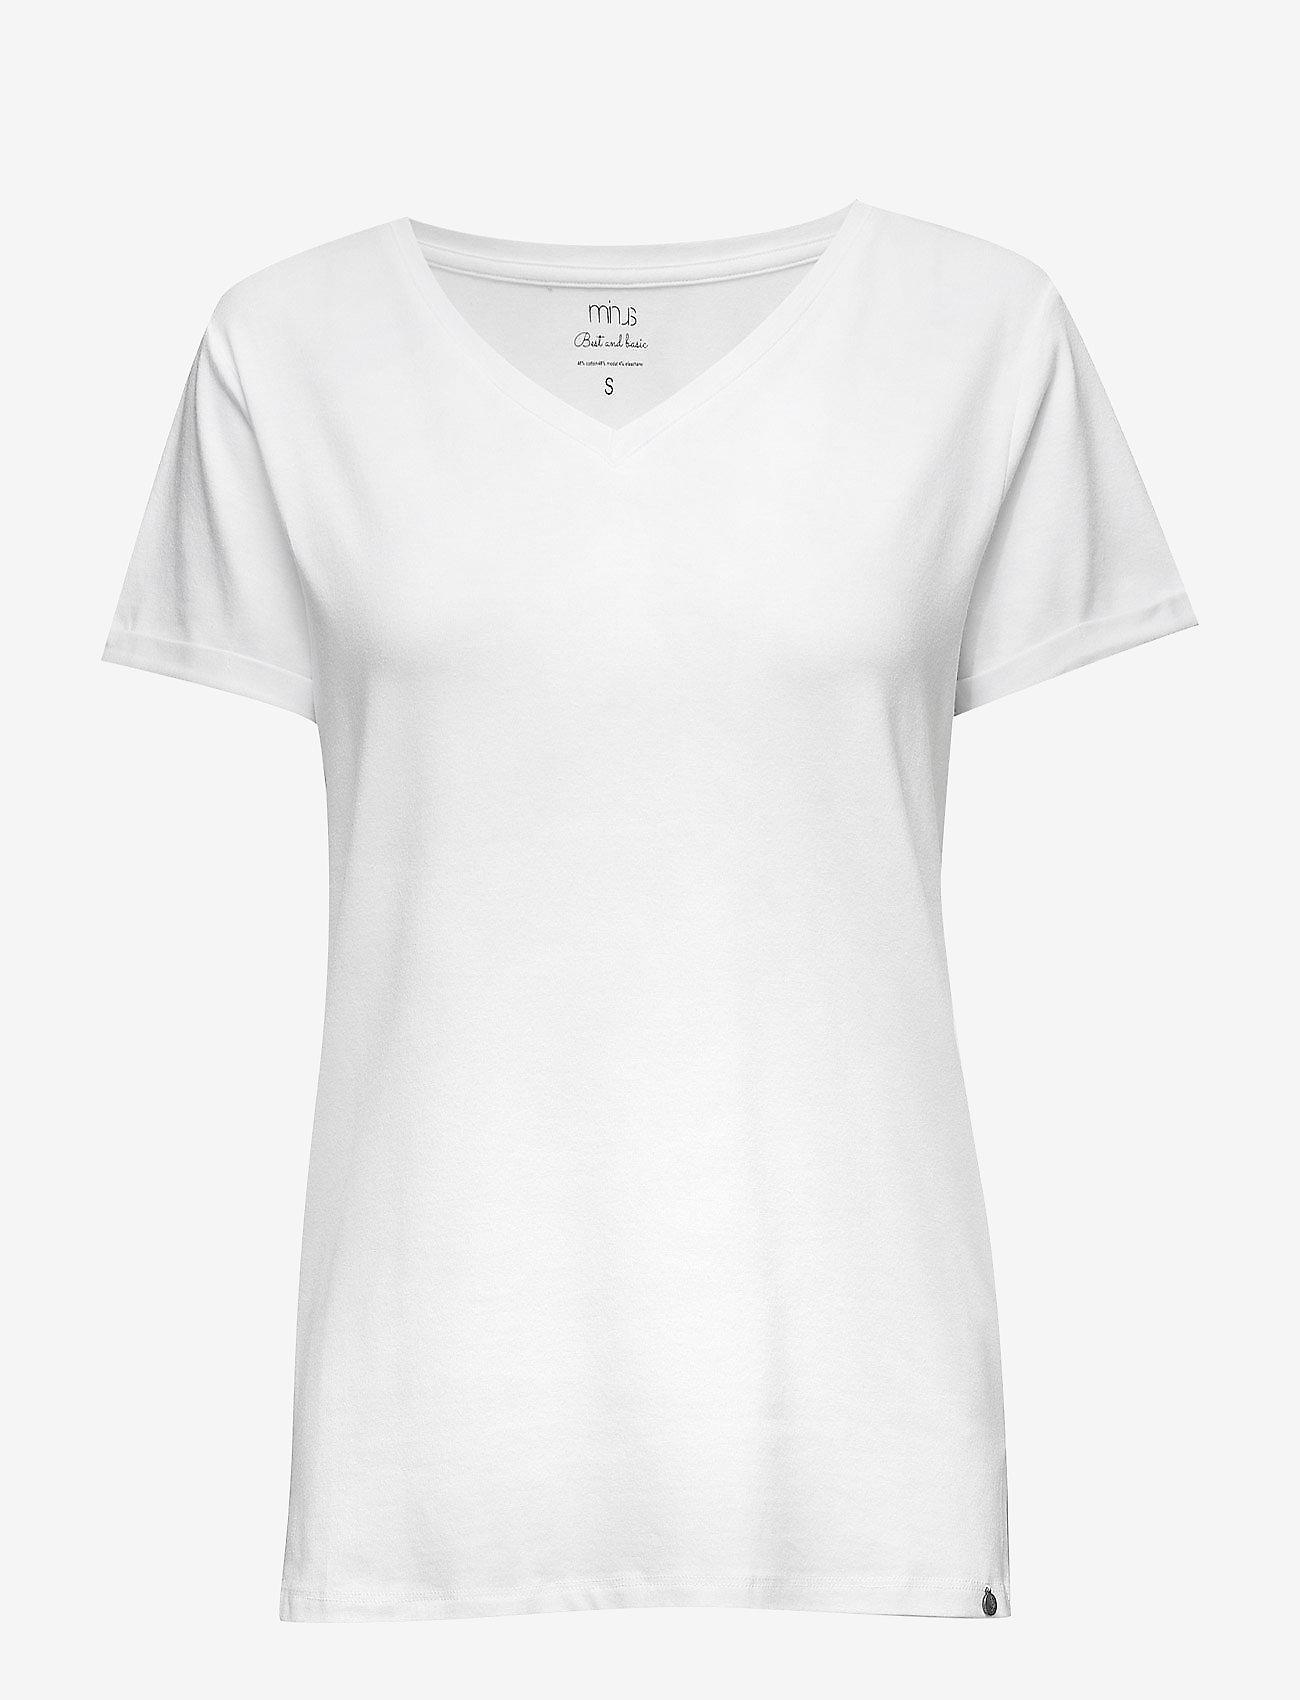 Minus - Adele tee - t-shirts - white - 0